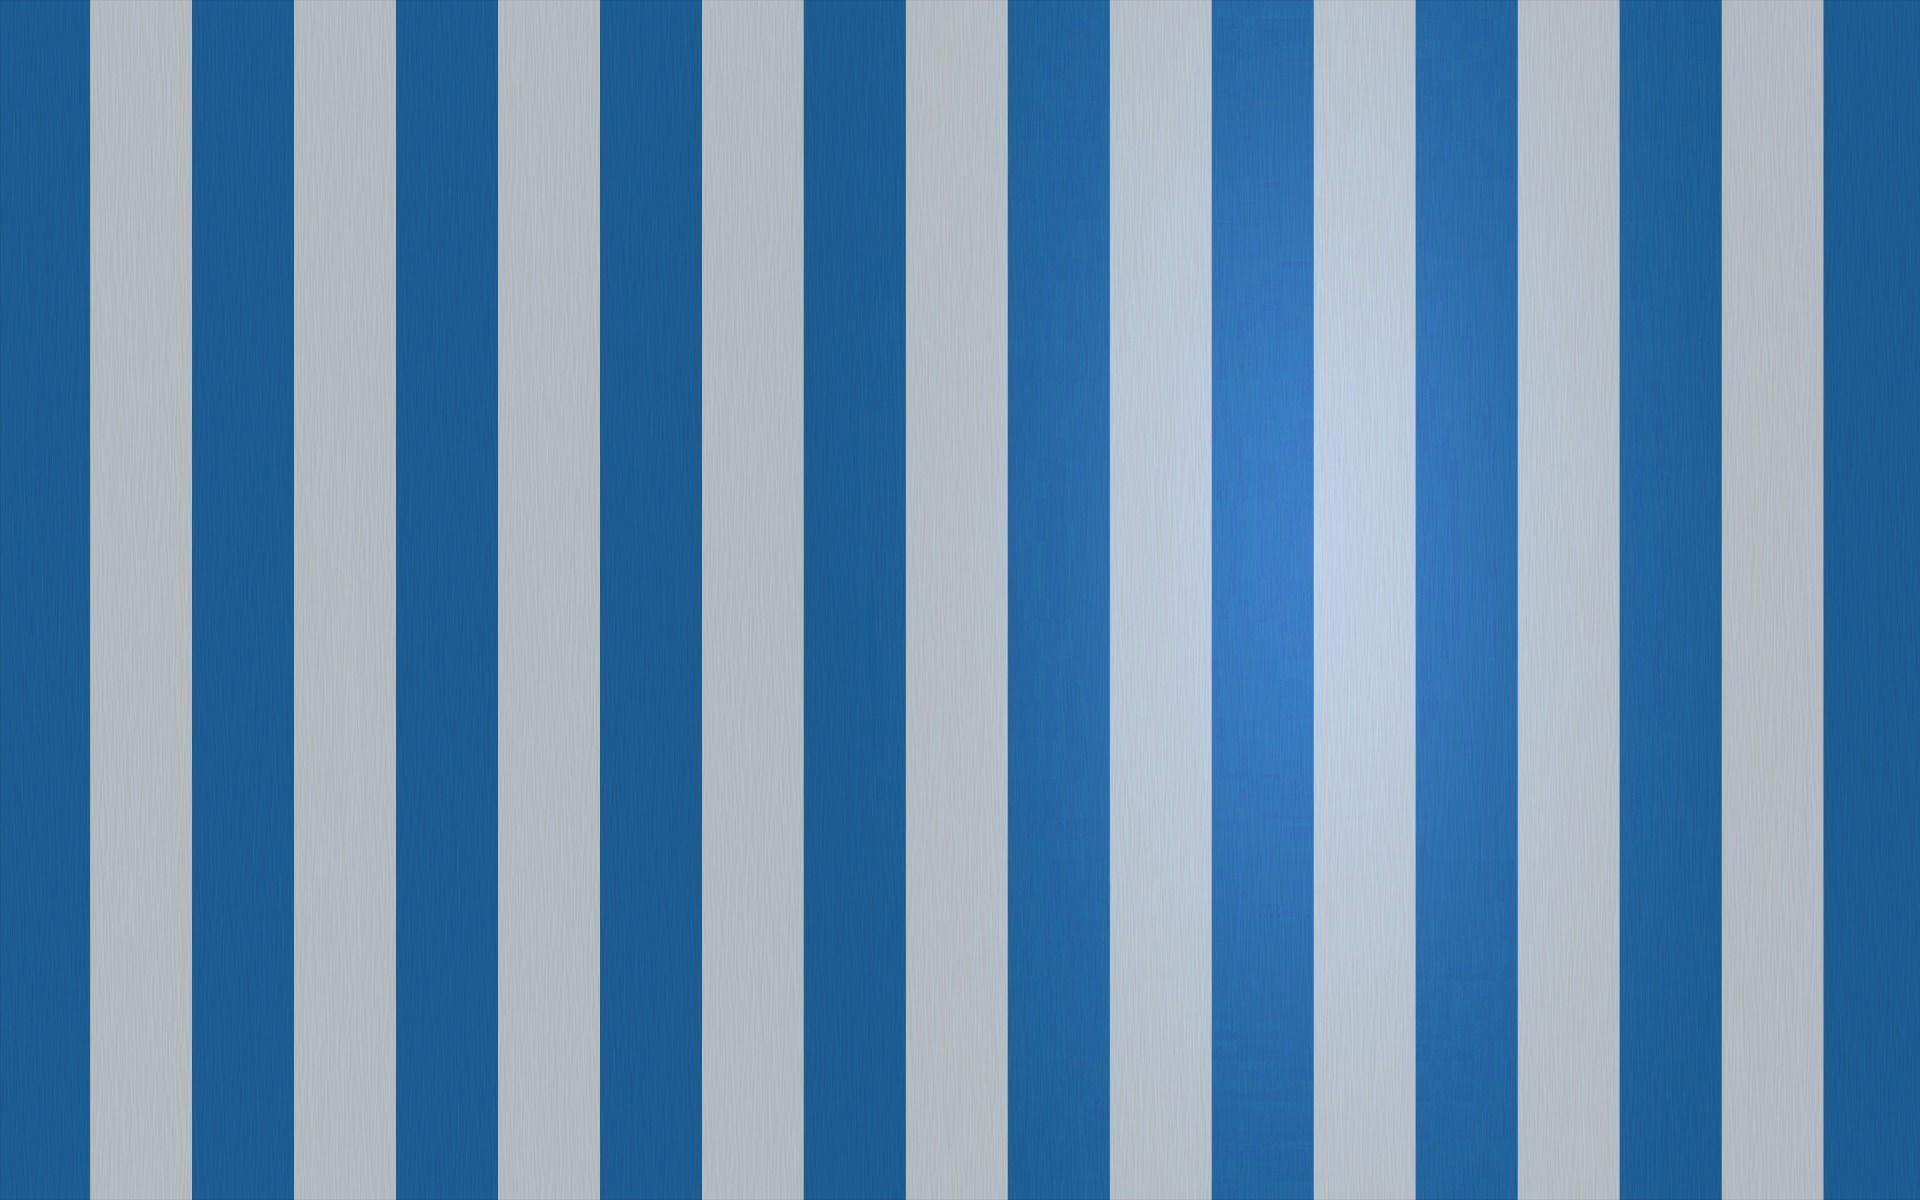 1920x1200 Wallpaper Stripes Blue Texture White Design Graphic